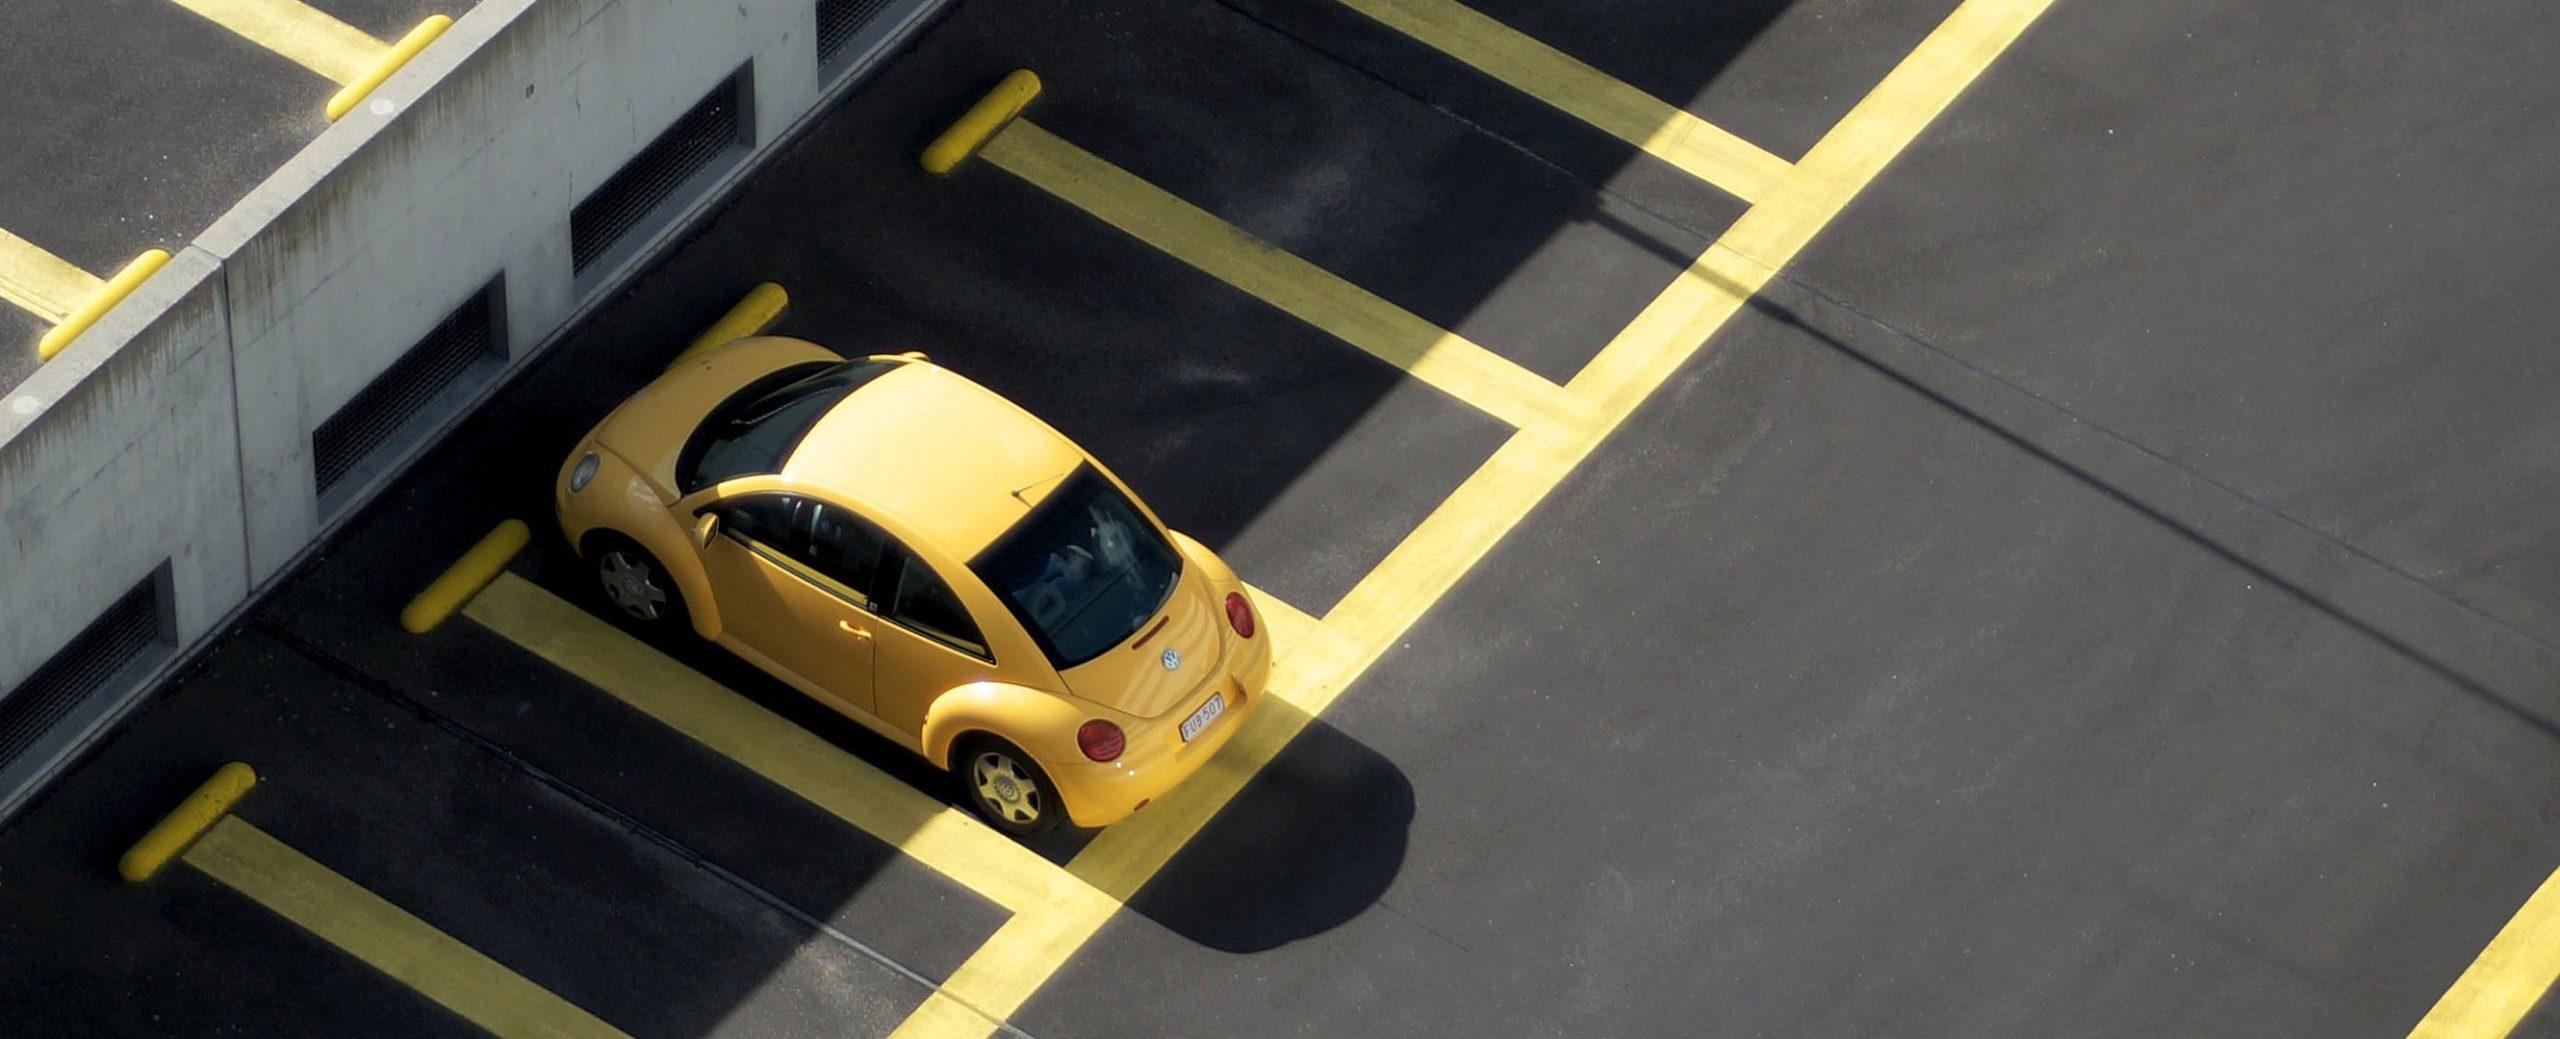 parking solution development